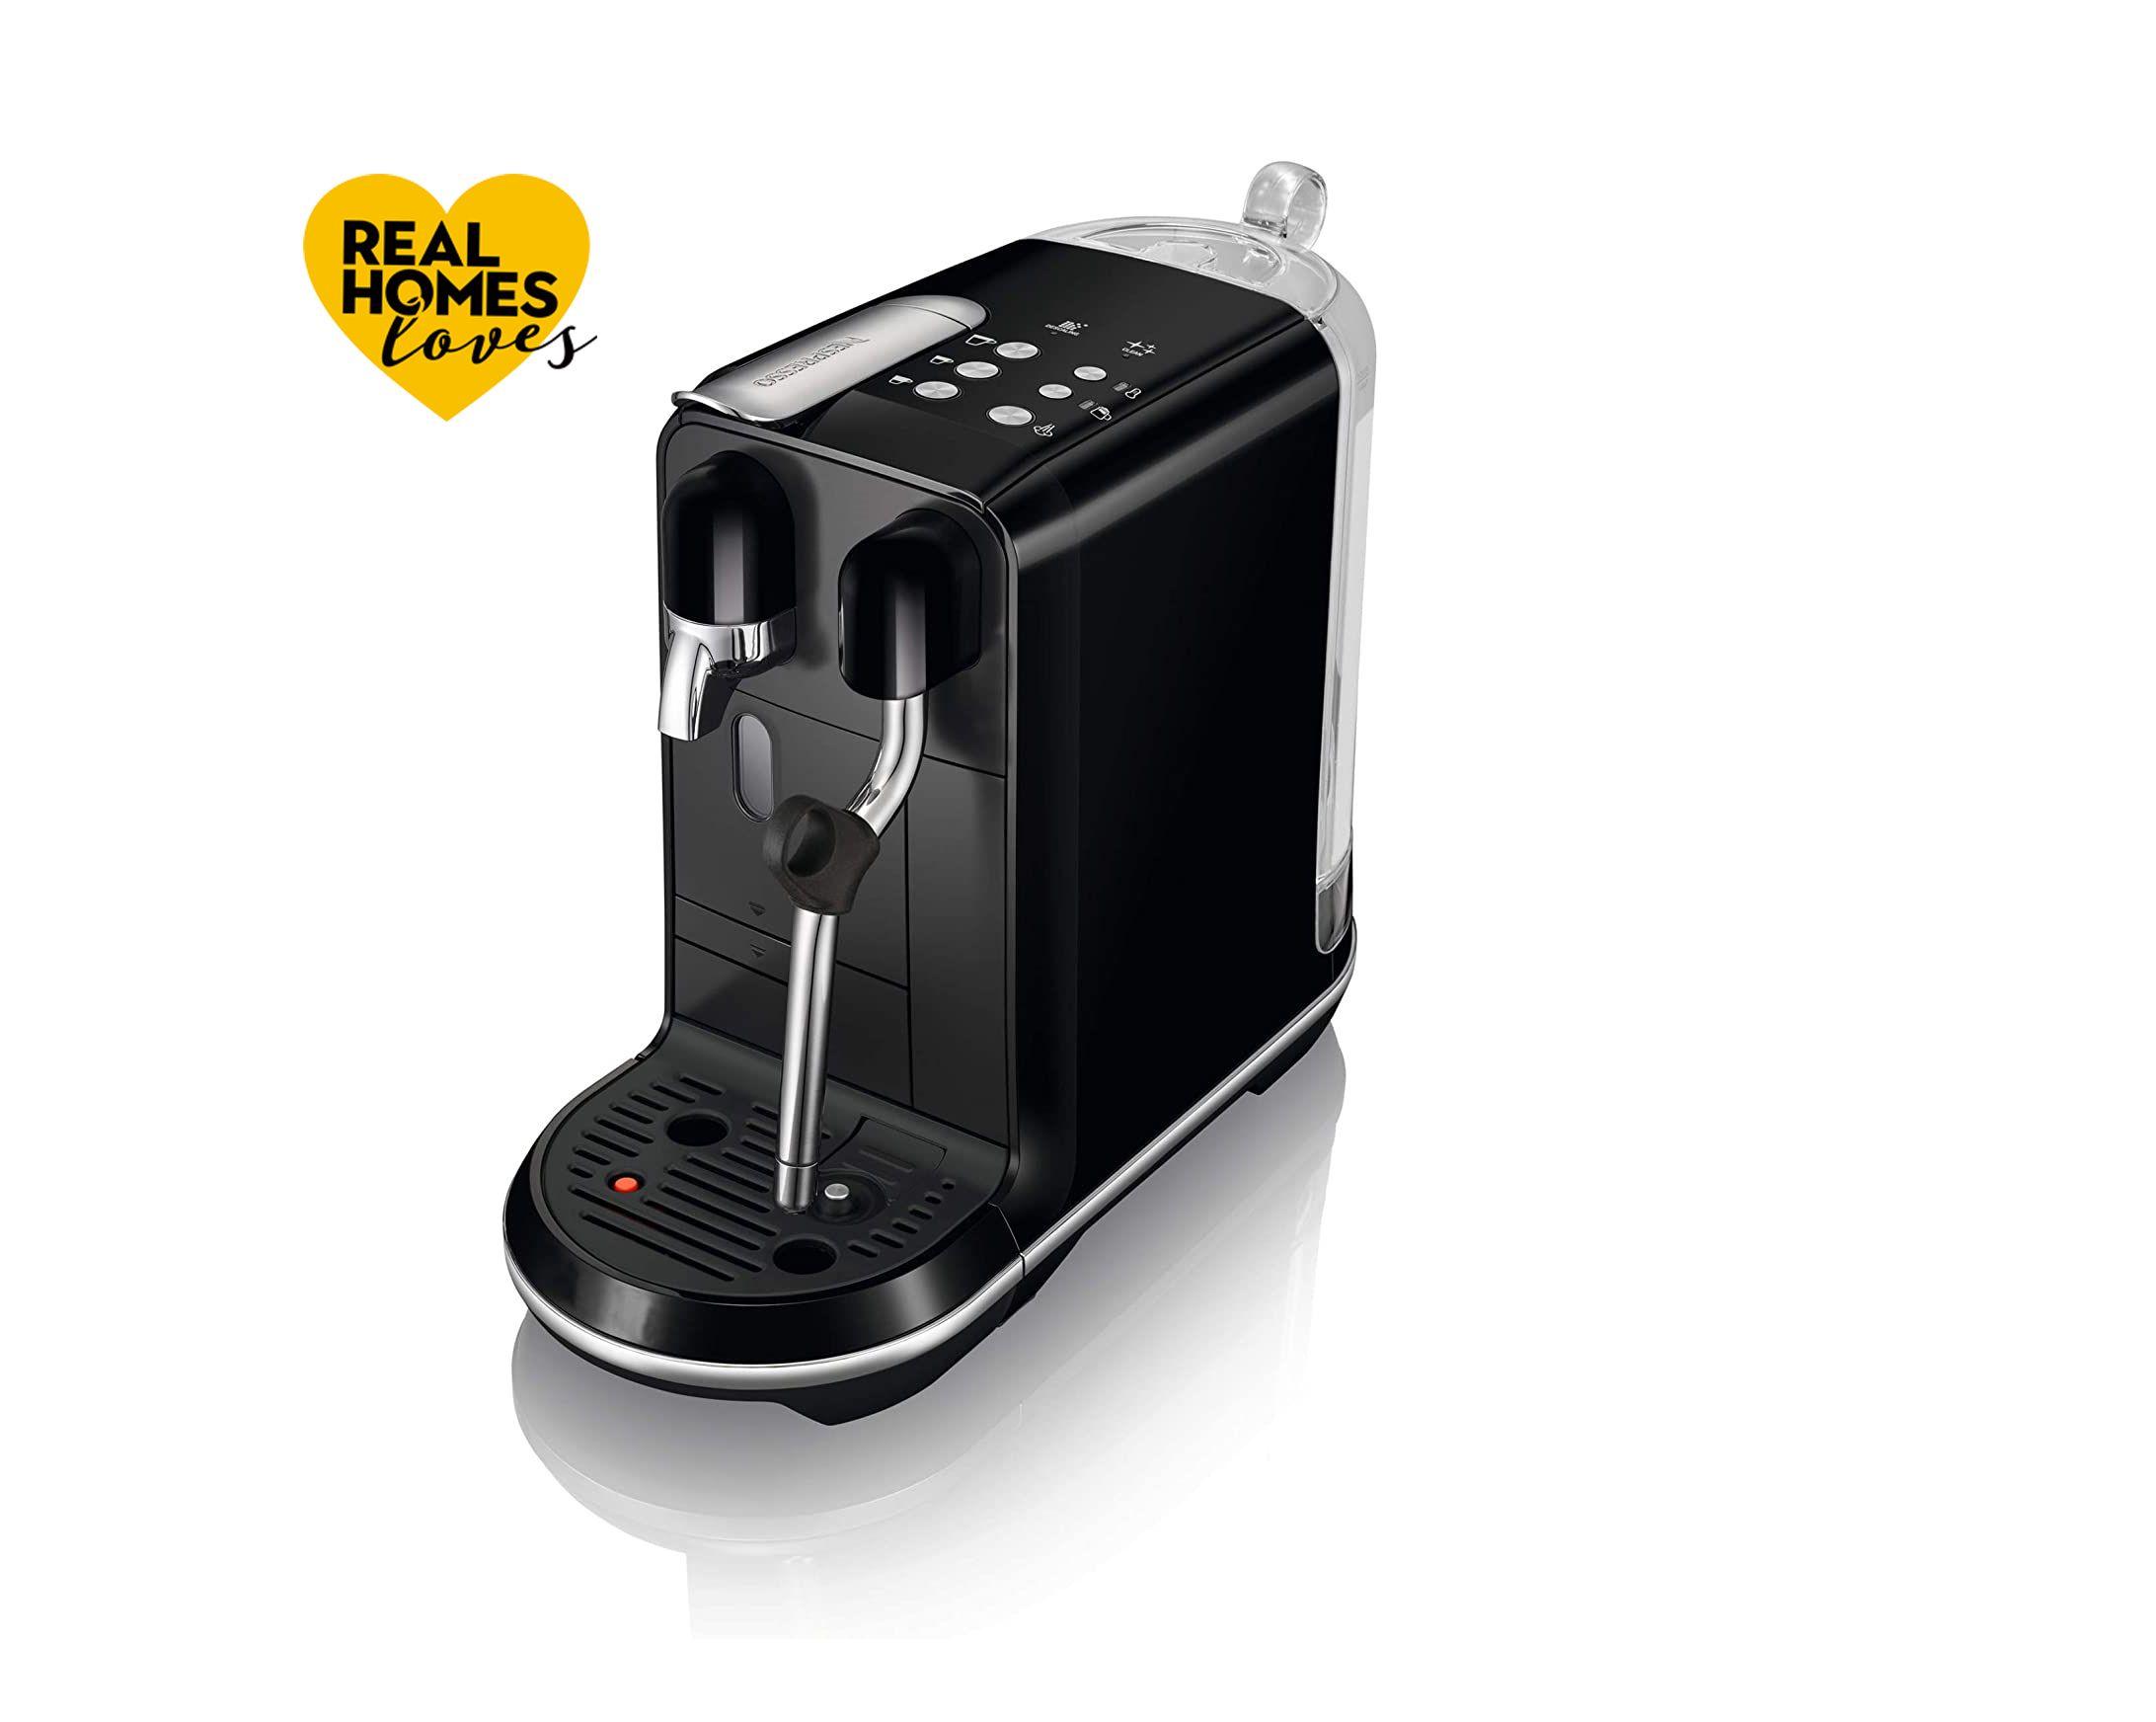 The Best Coffee Machines 2020 In 2020 Best Coffee Coffee Machine Best